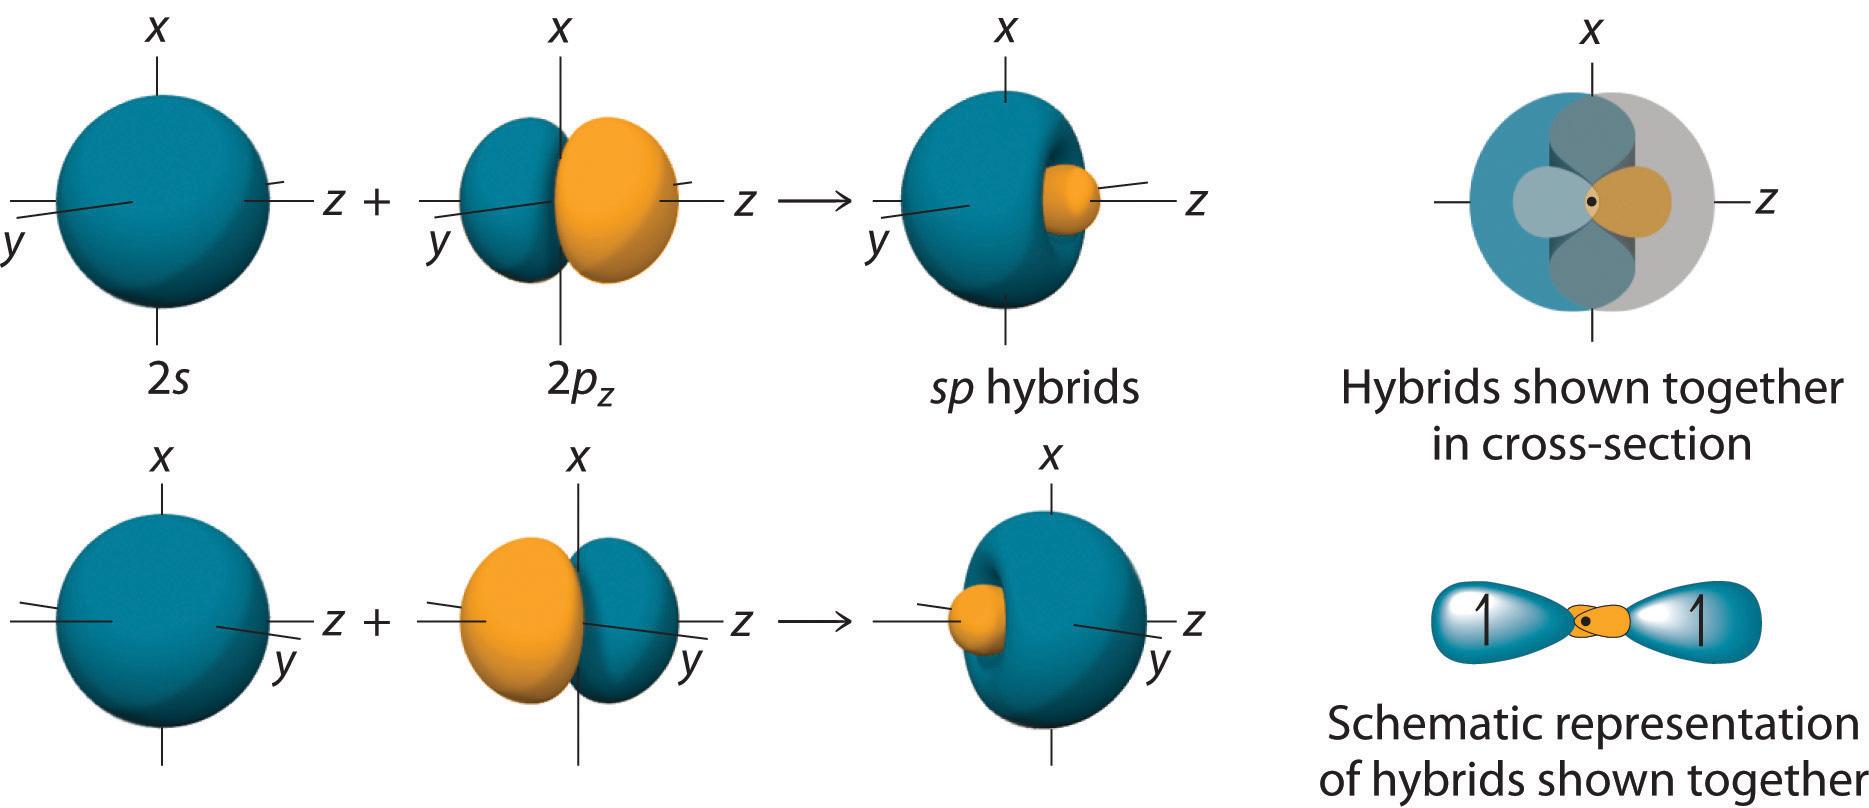 Molecular Geometry And Covalent Bonding Models Diagram Of An Oxygen Atom Photo Album Diagrams